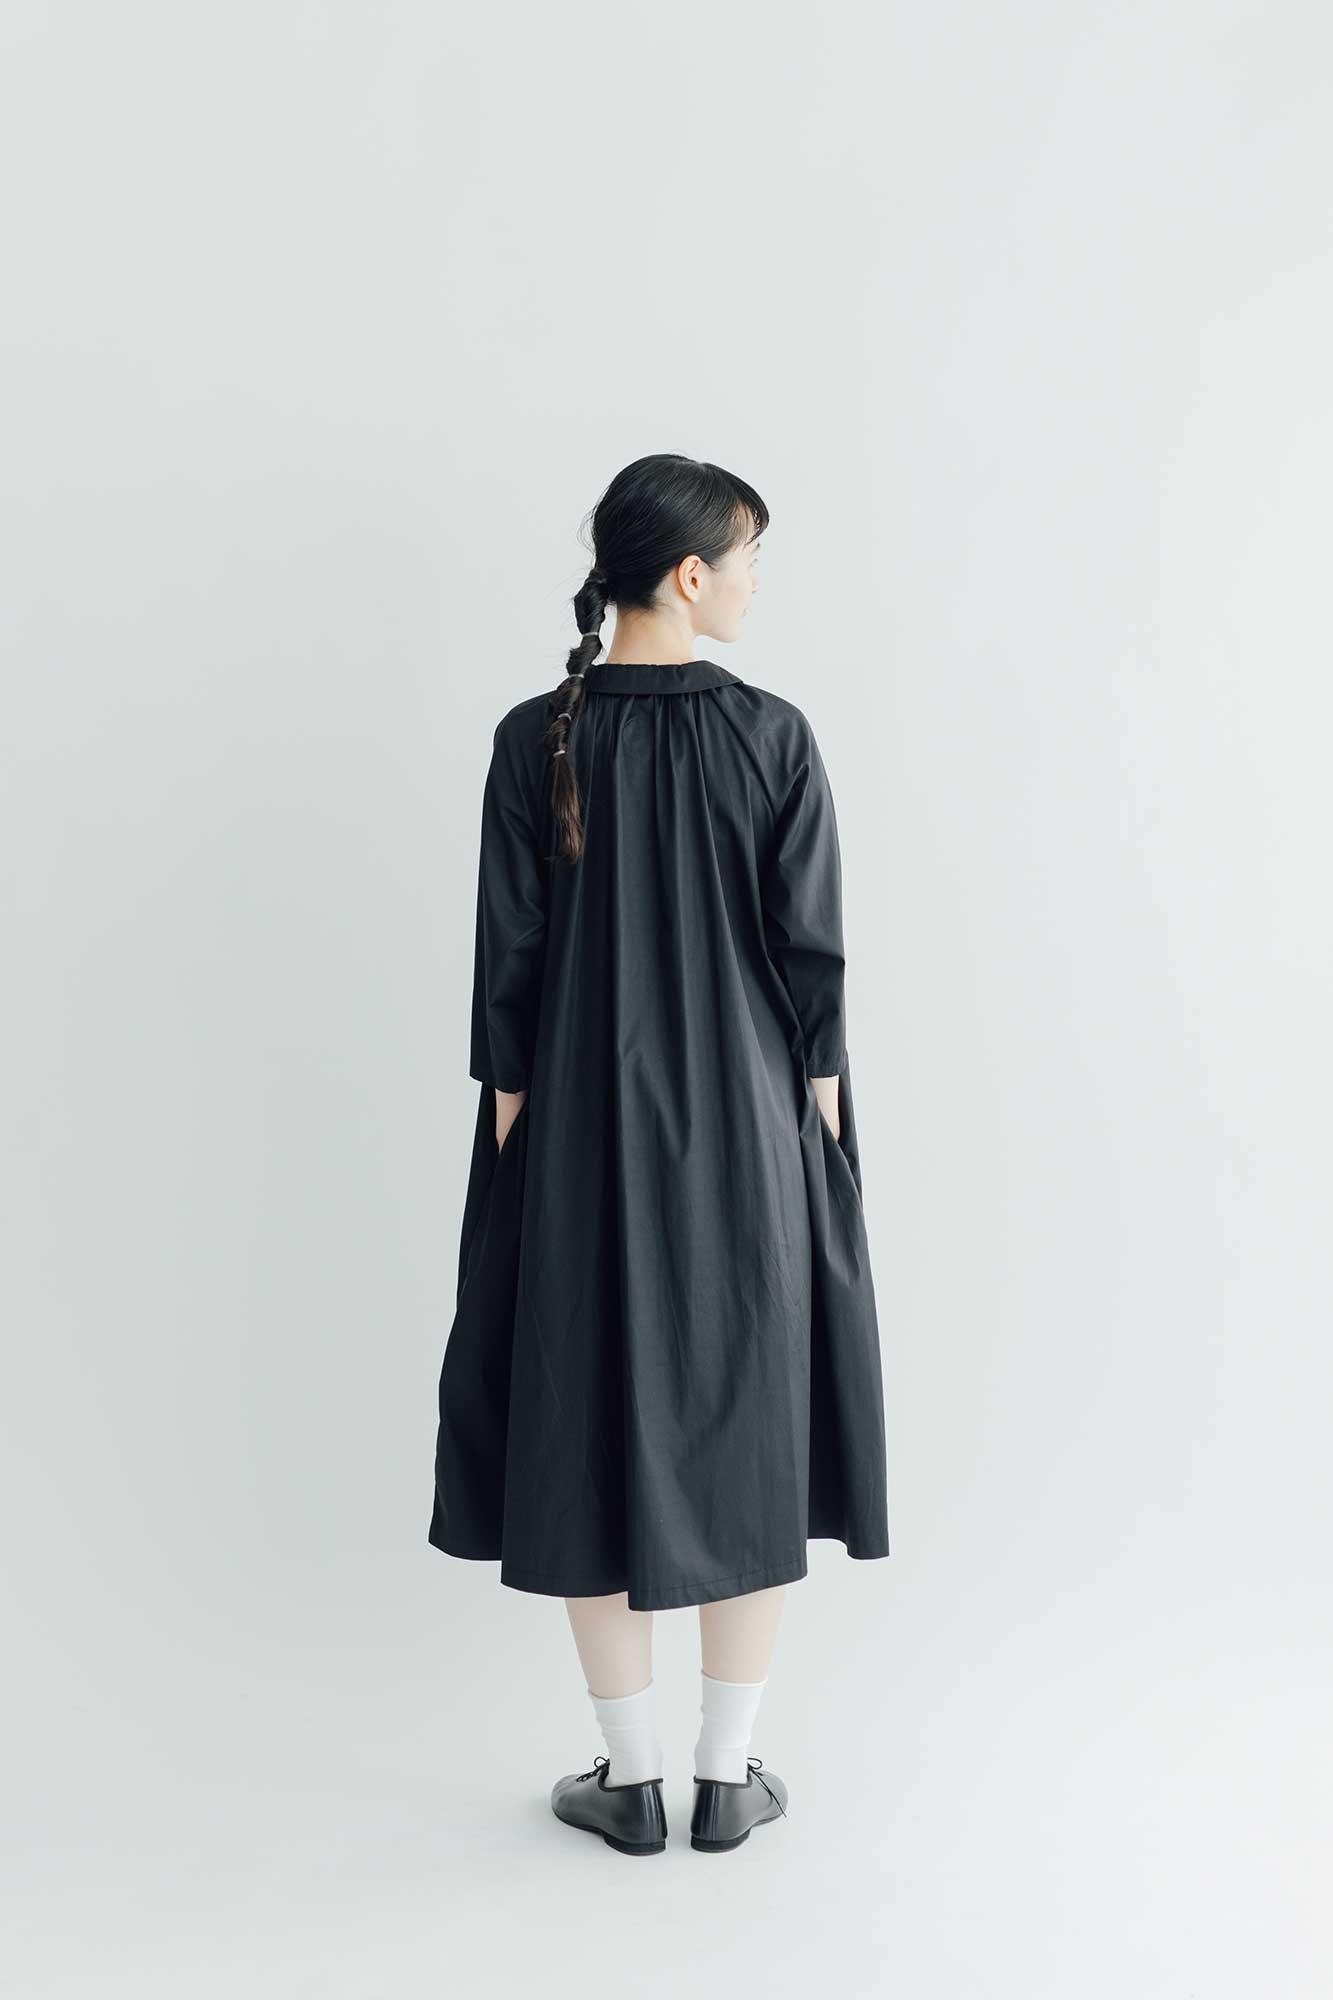 Atelier d'antan Aimee コットン ワンピース  (SPRING)  ブラック